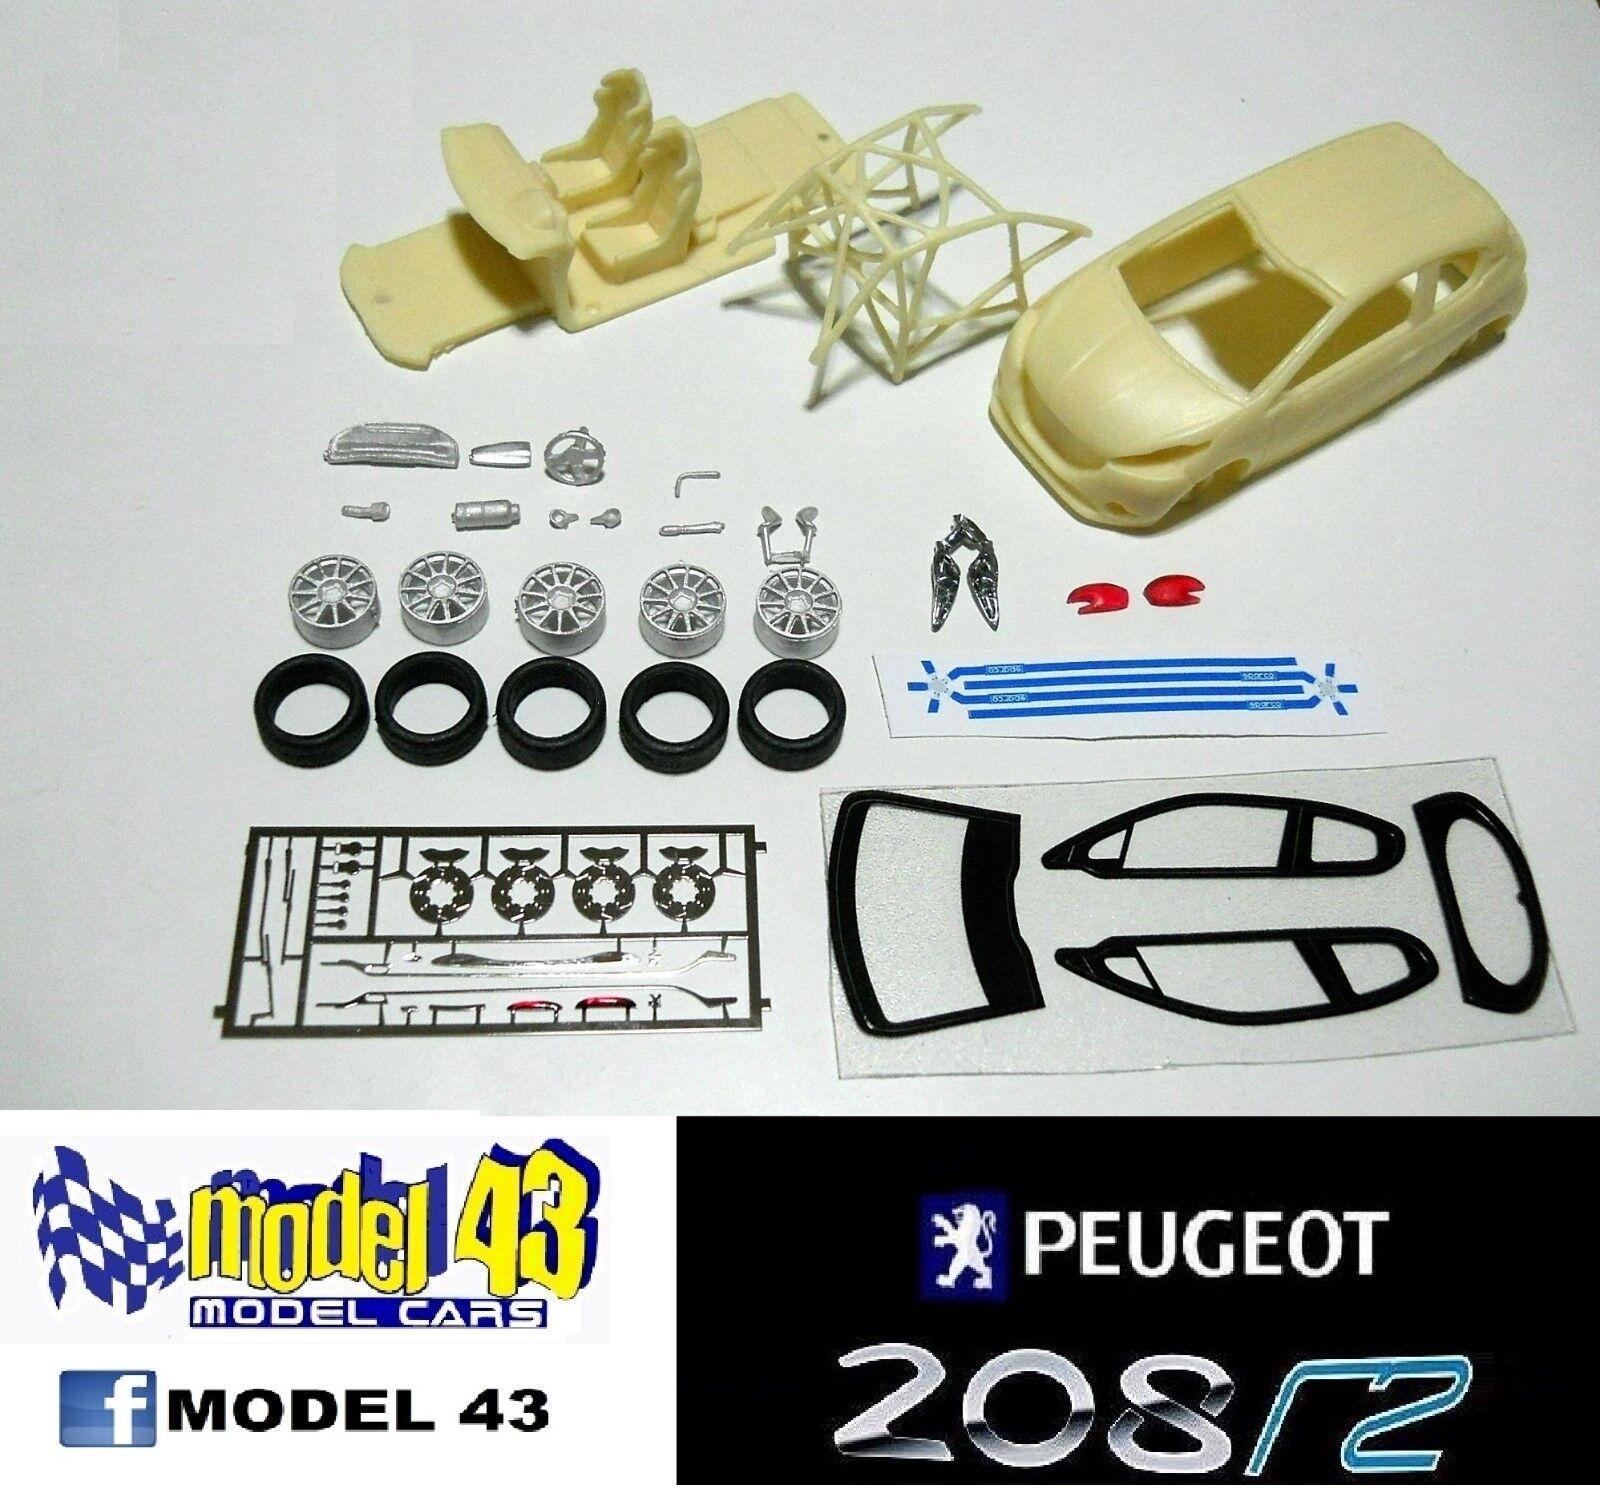 Peugeot 208 R2 - KIT MONTAGE